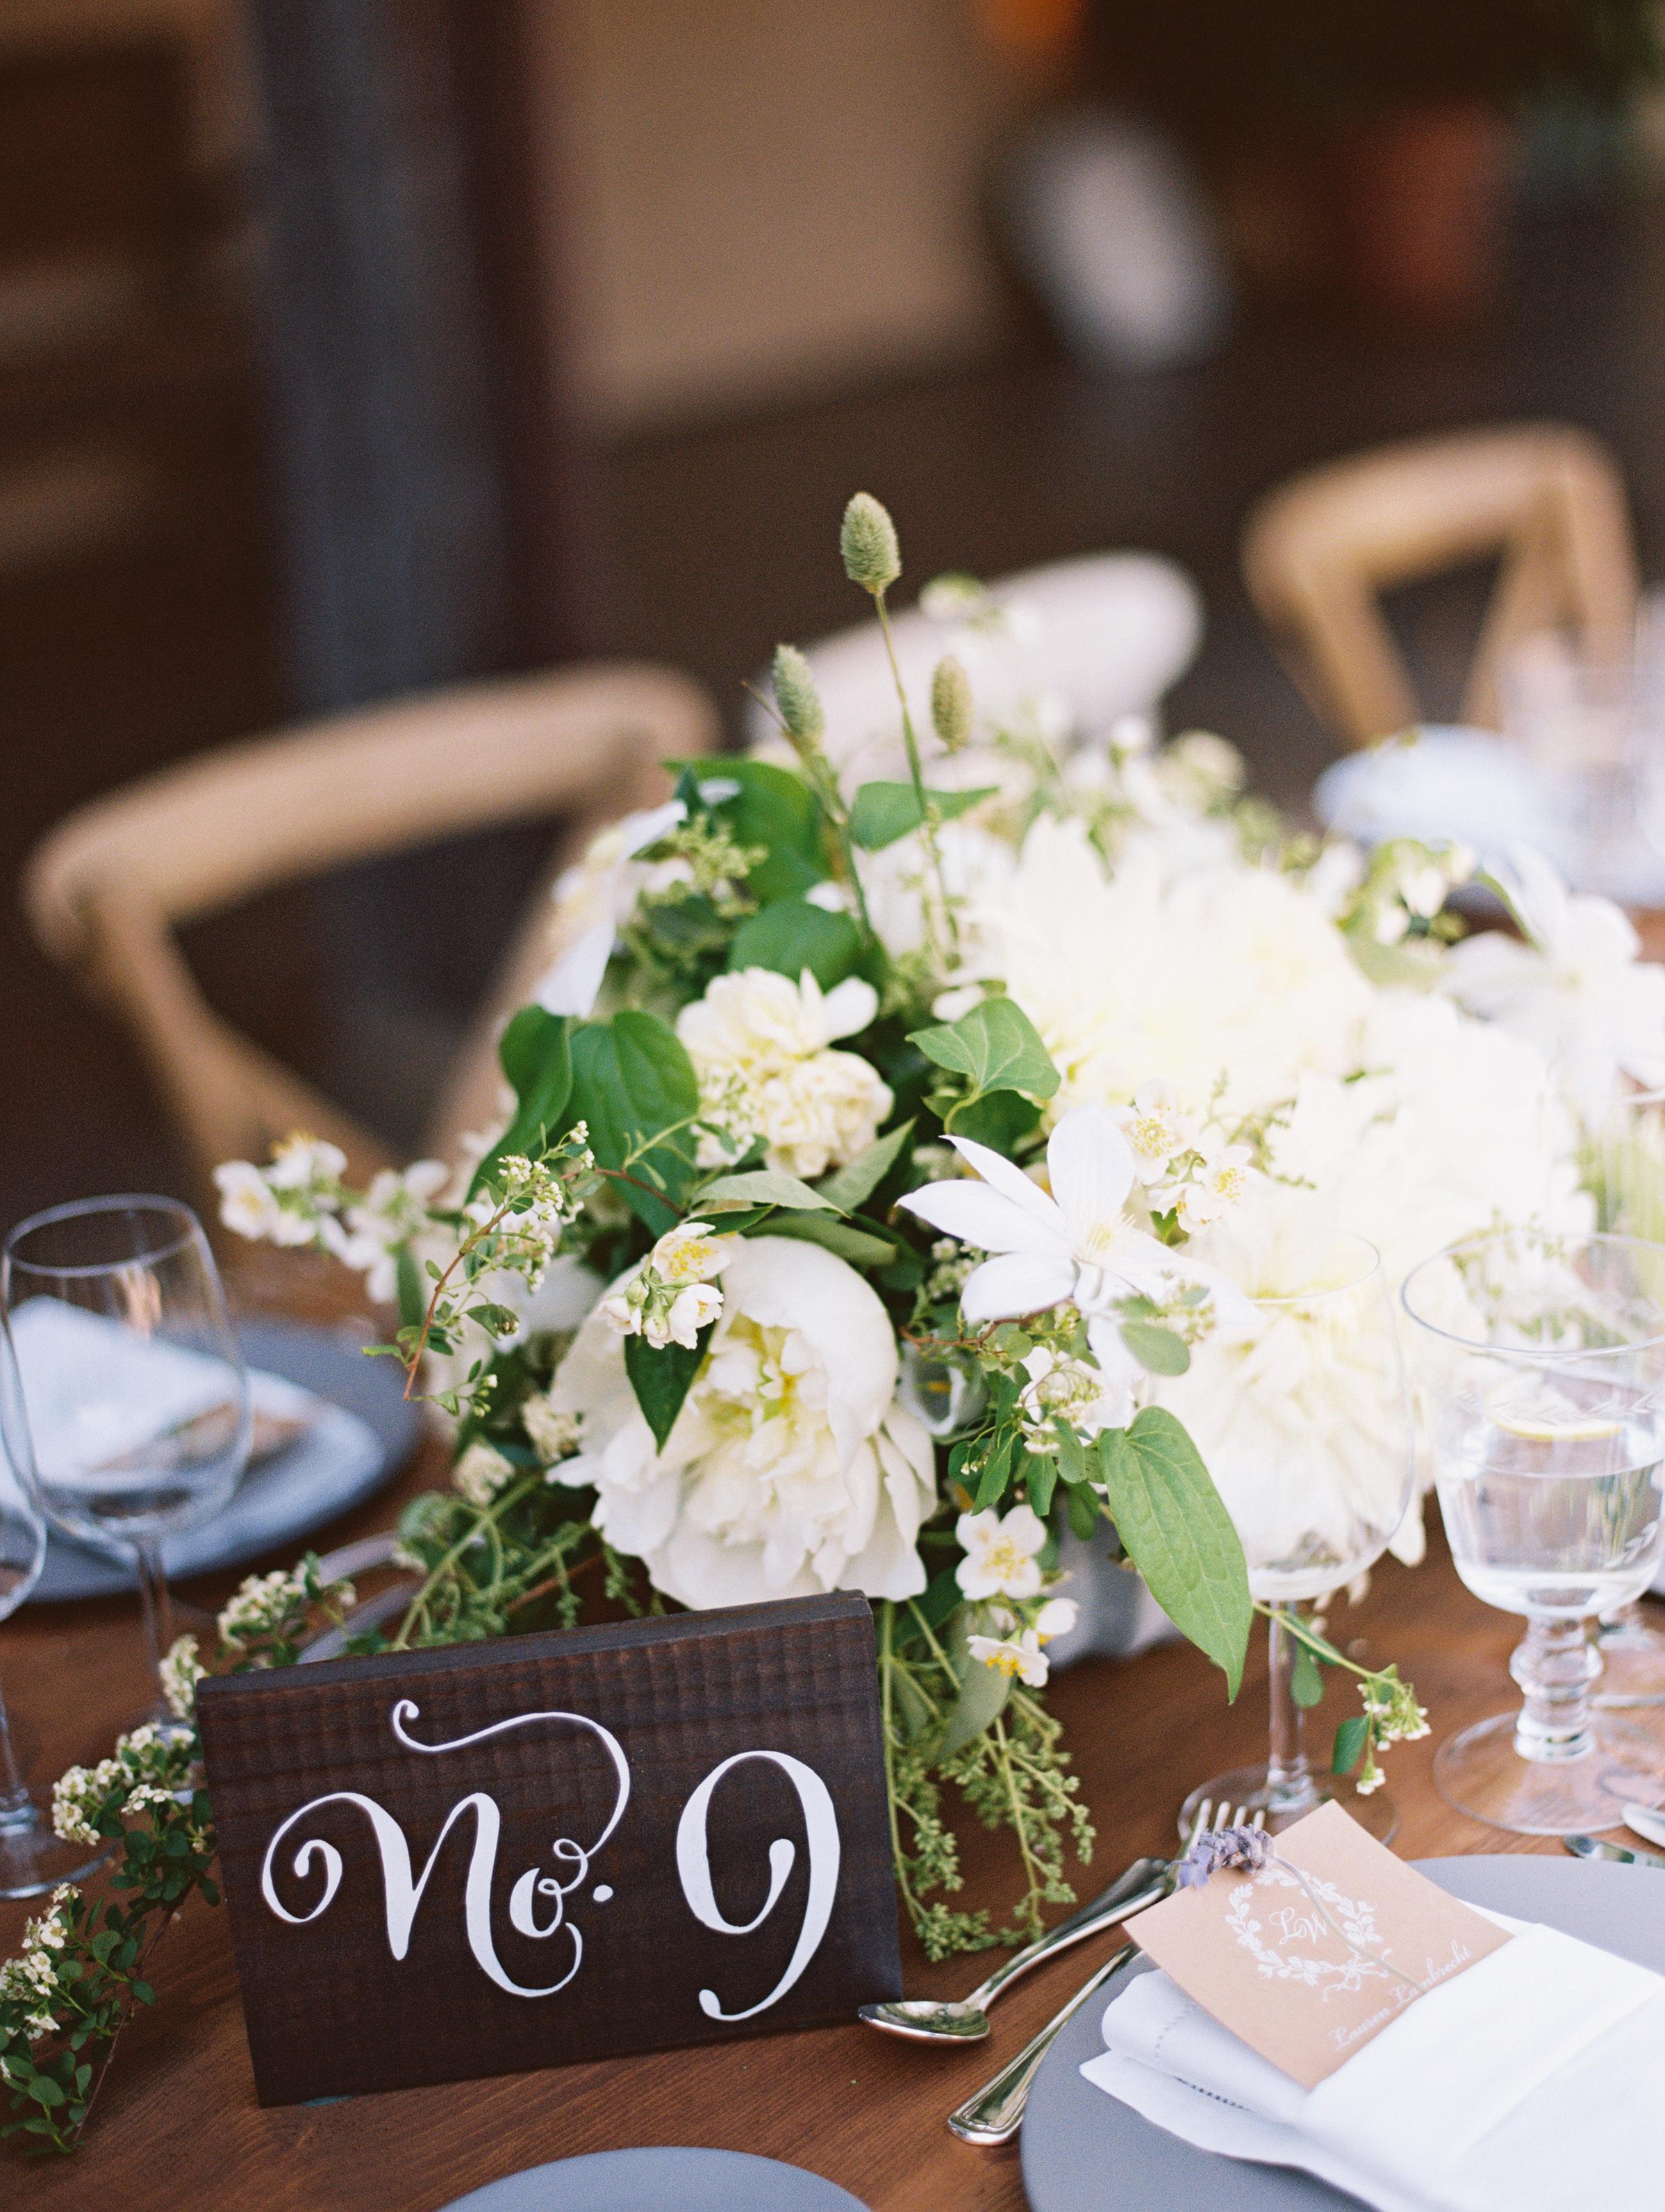 magnoliaeventdesign.com | Wedding at Santa Barbara Historical Museum | Magnolia Event Design | Pat Moyer Photography